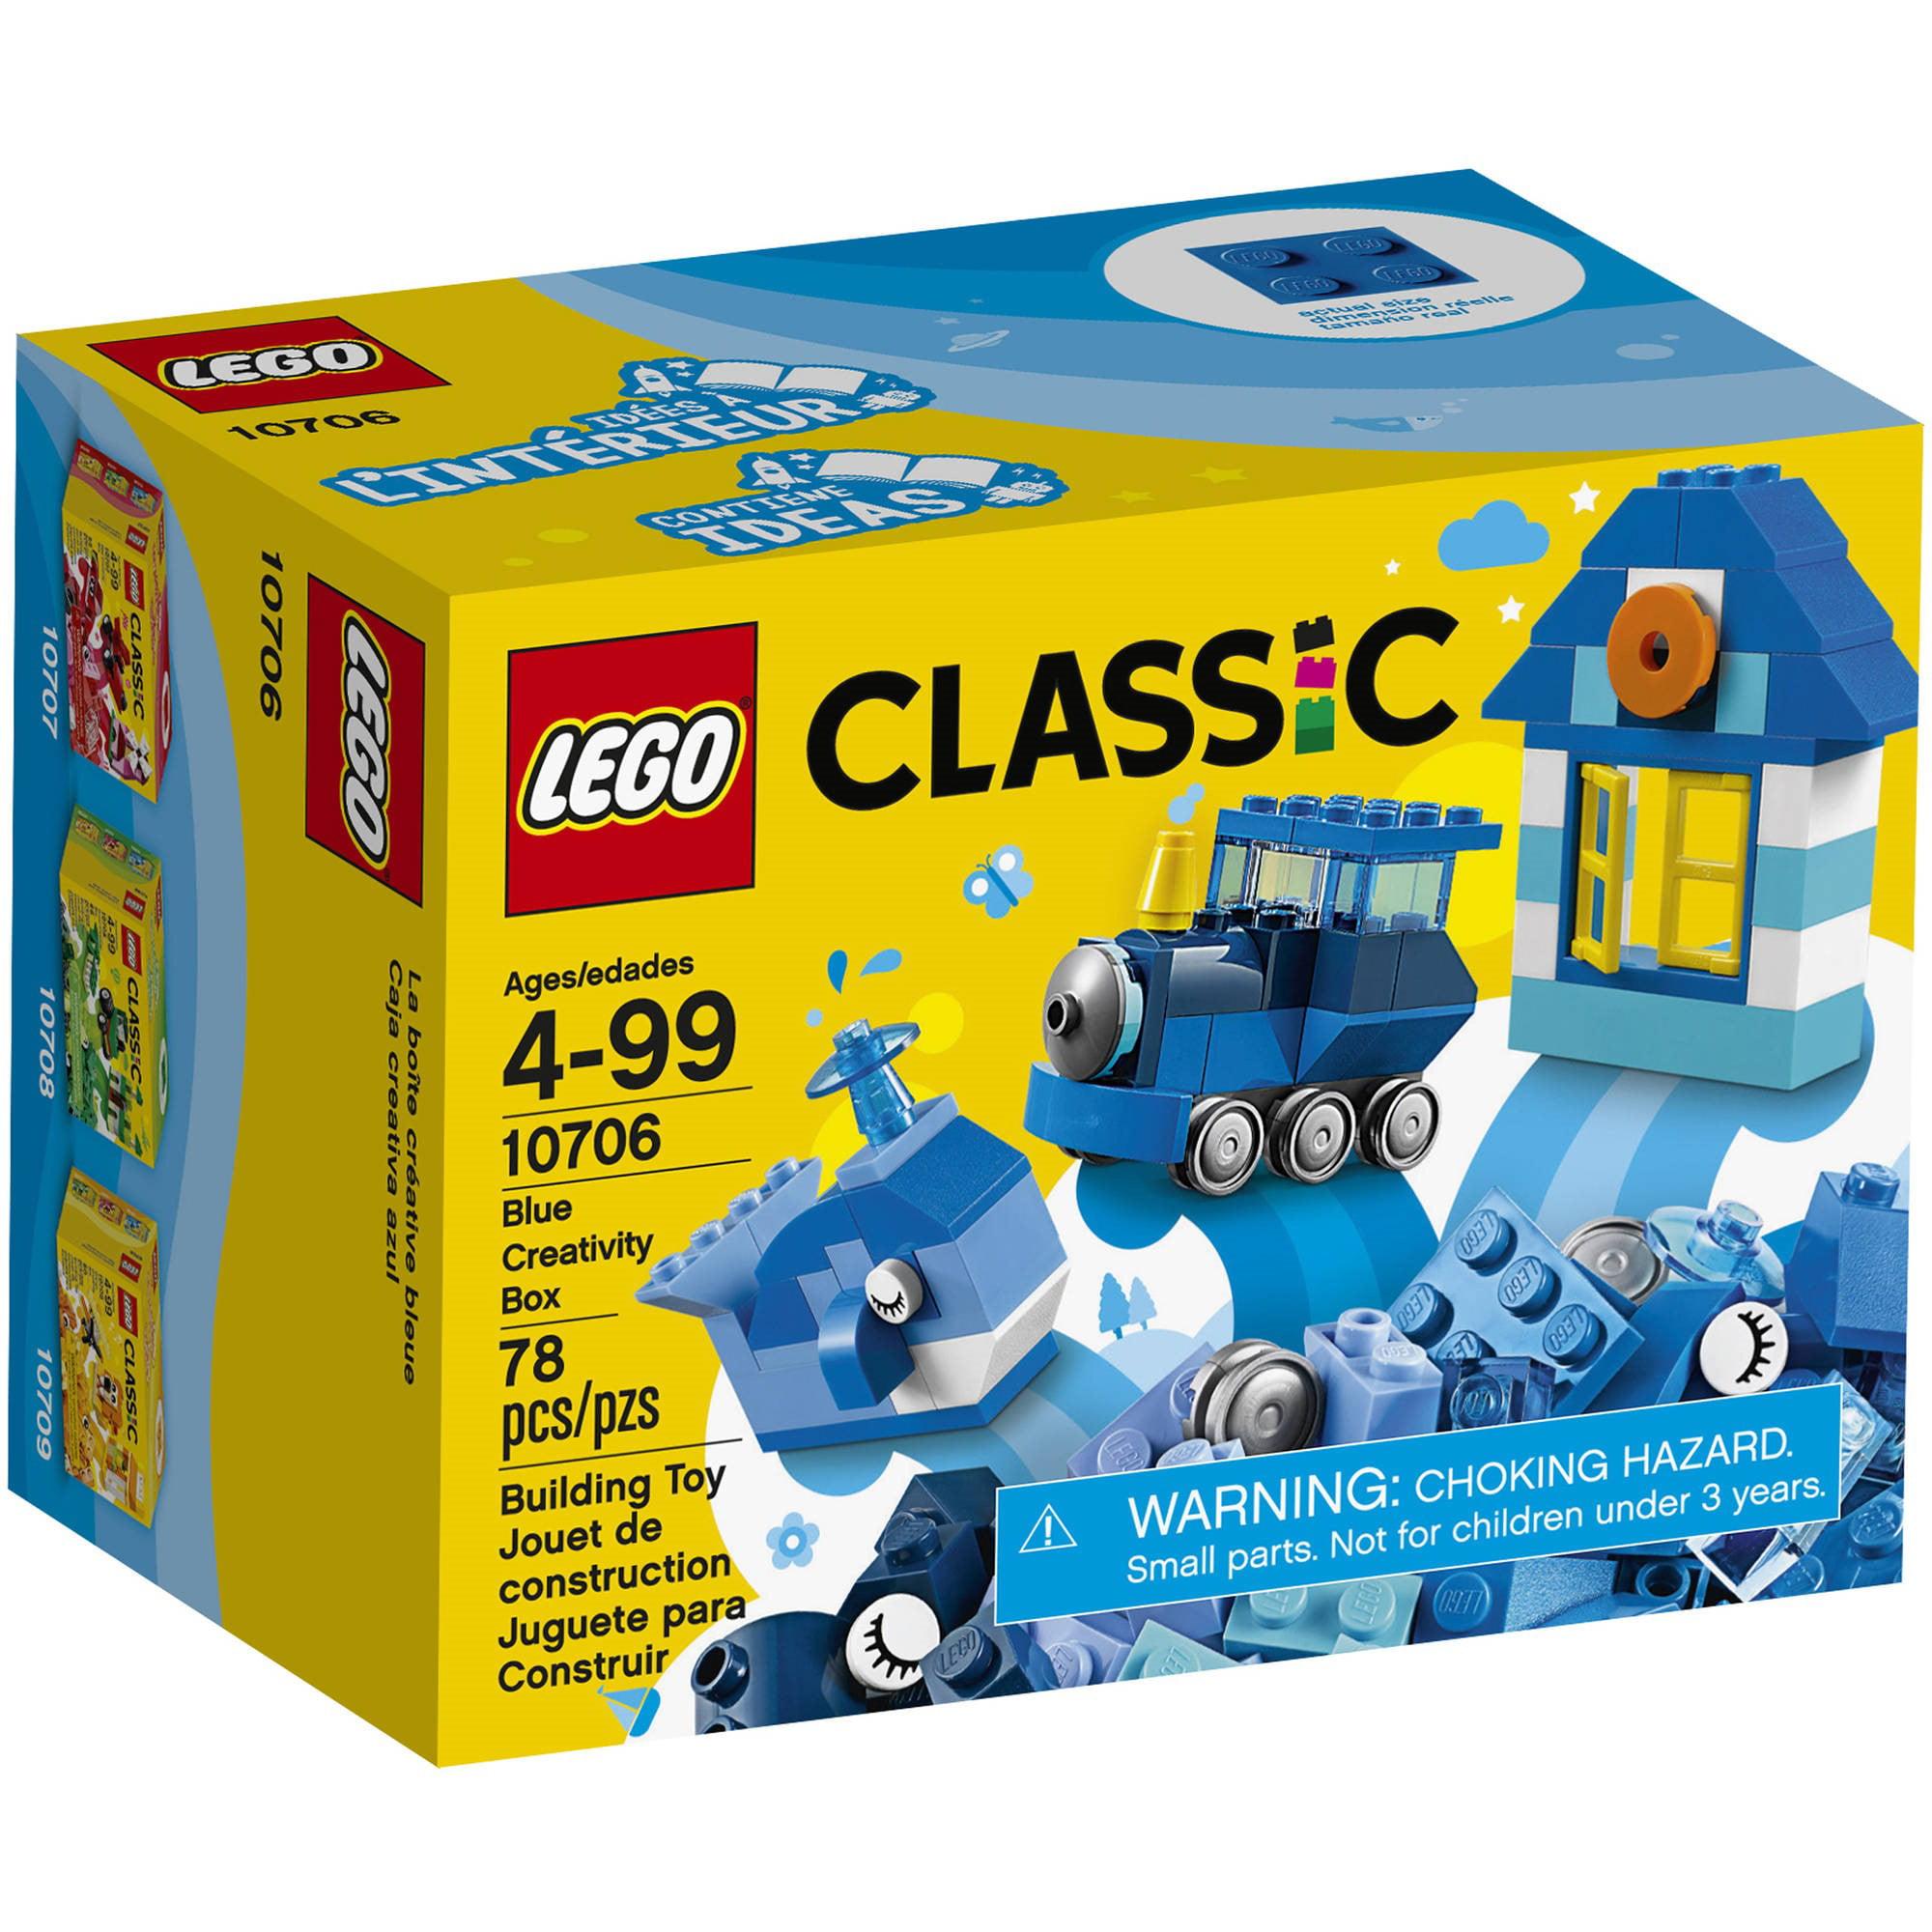 LEGO¨ Classic Blue Creativity Box 10706 (78 Pieces)